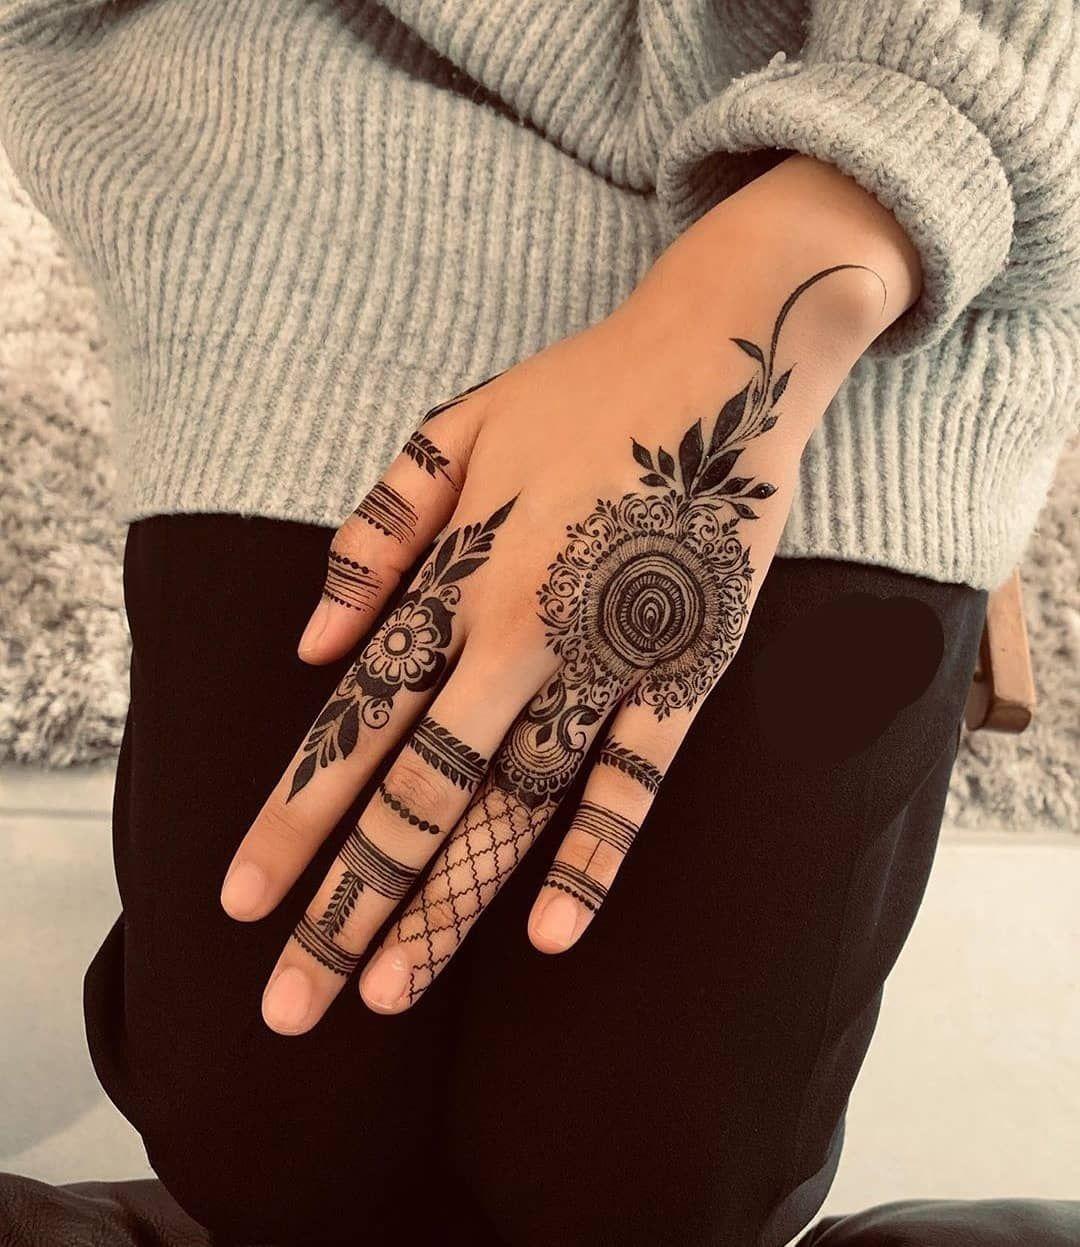 Intricate Floral Mehndi Design